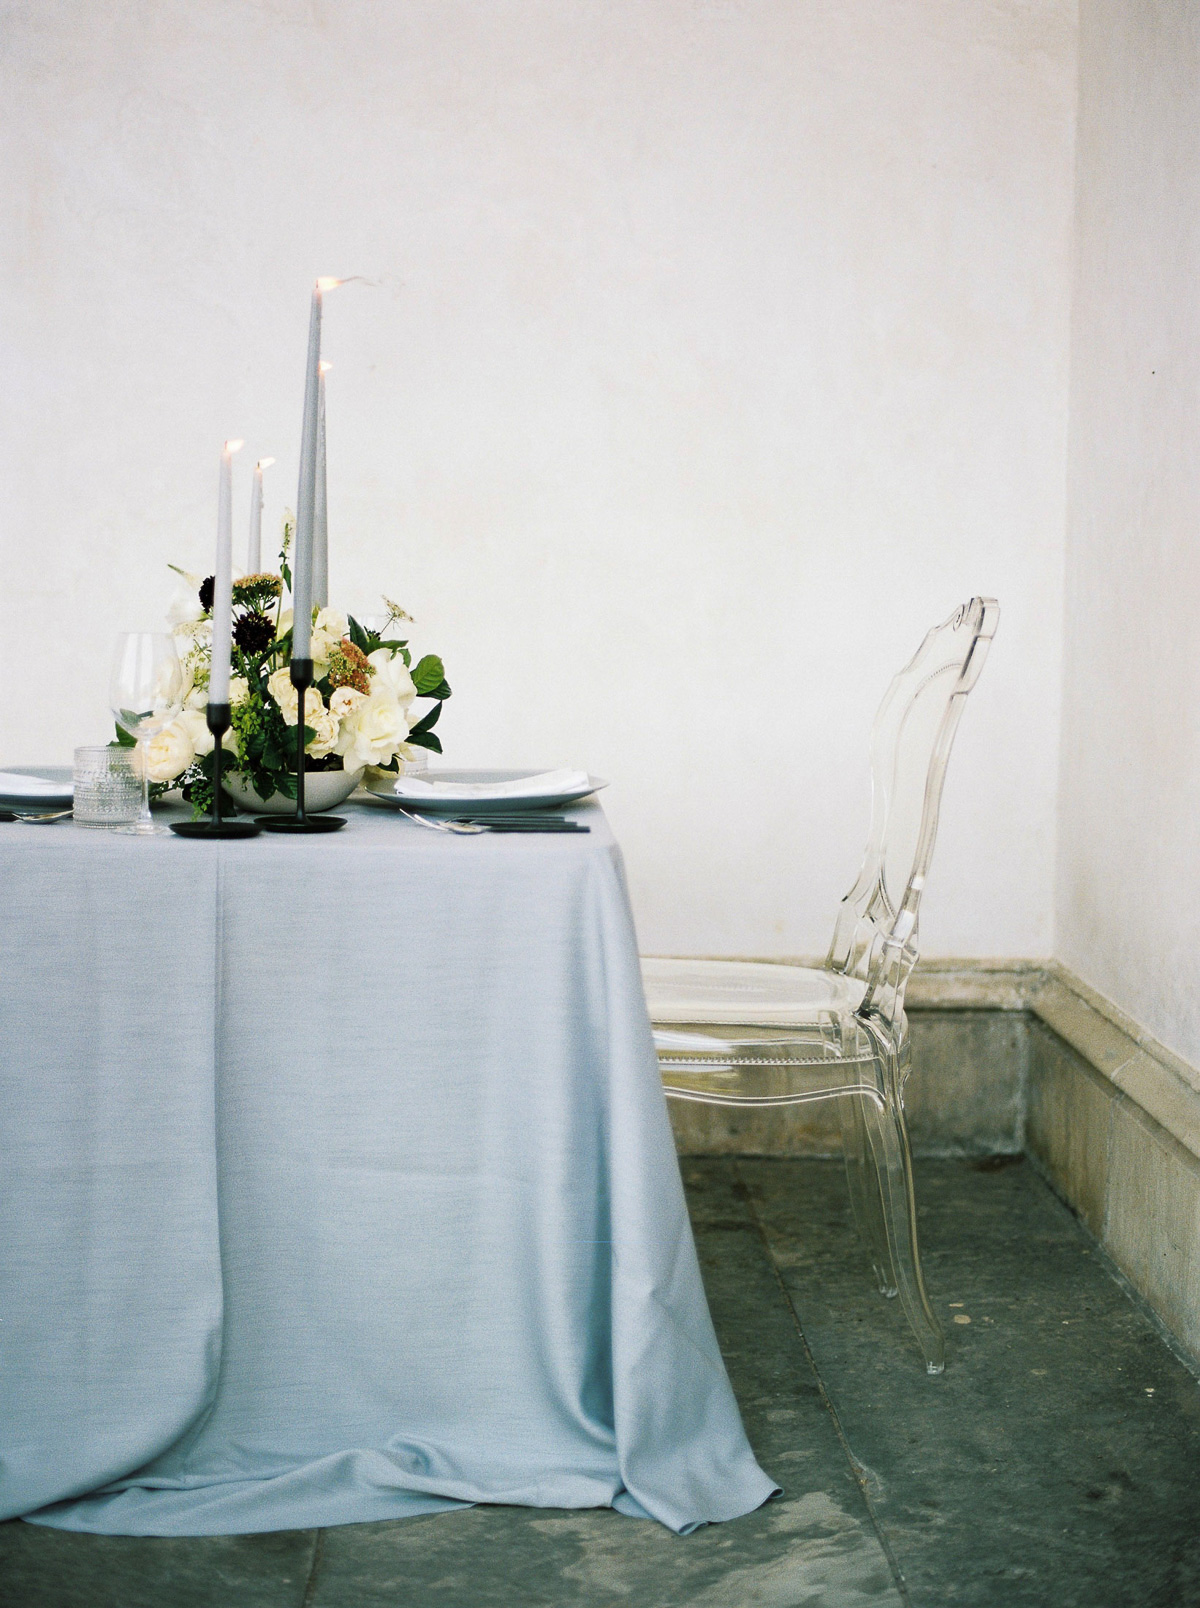 kurtz-orpia-photography-vineyard-bride-swish-list-dundurn-castle-dundas-wedding-editorial-28.jpg